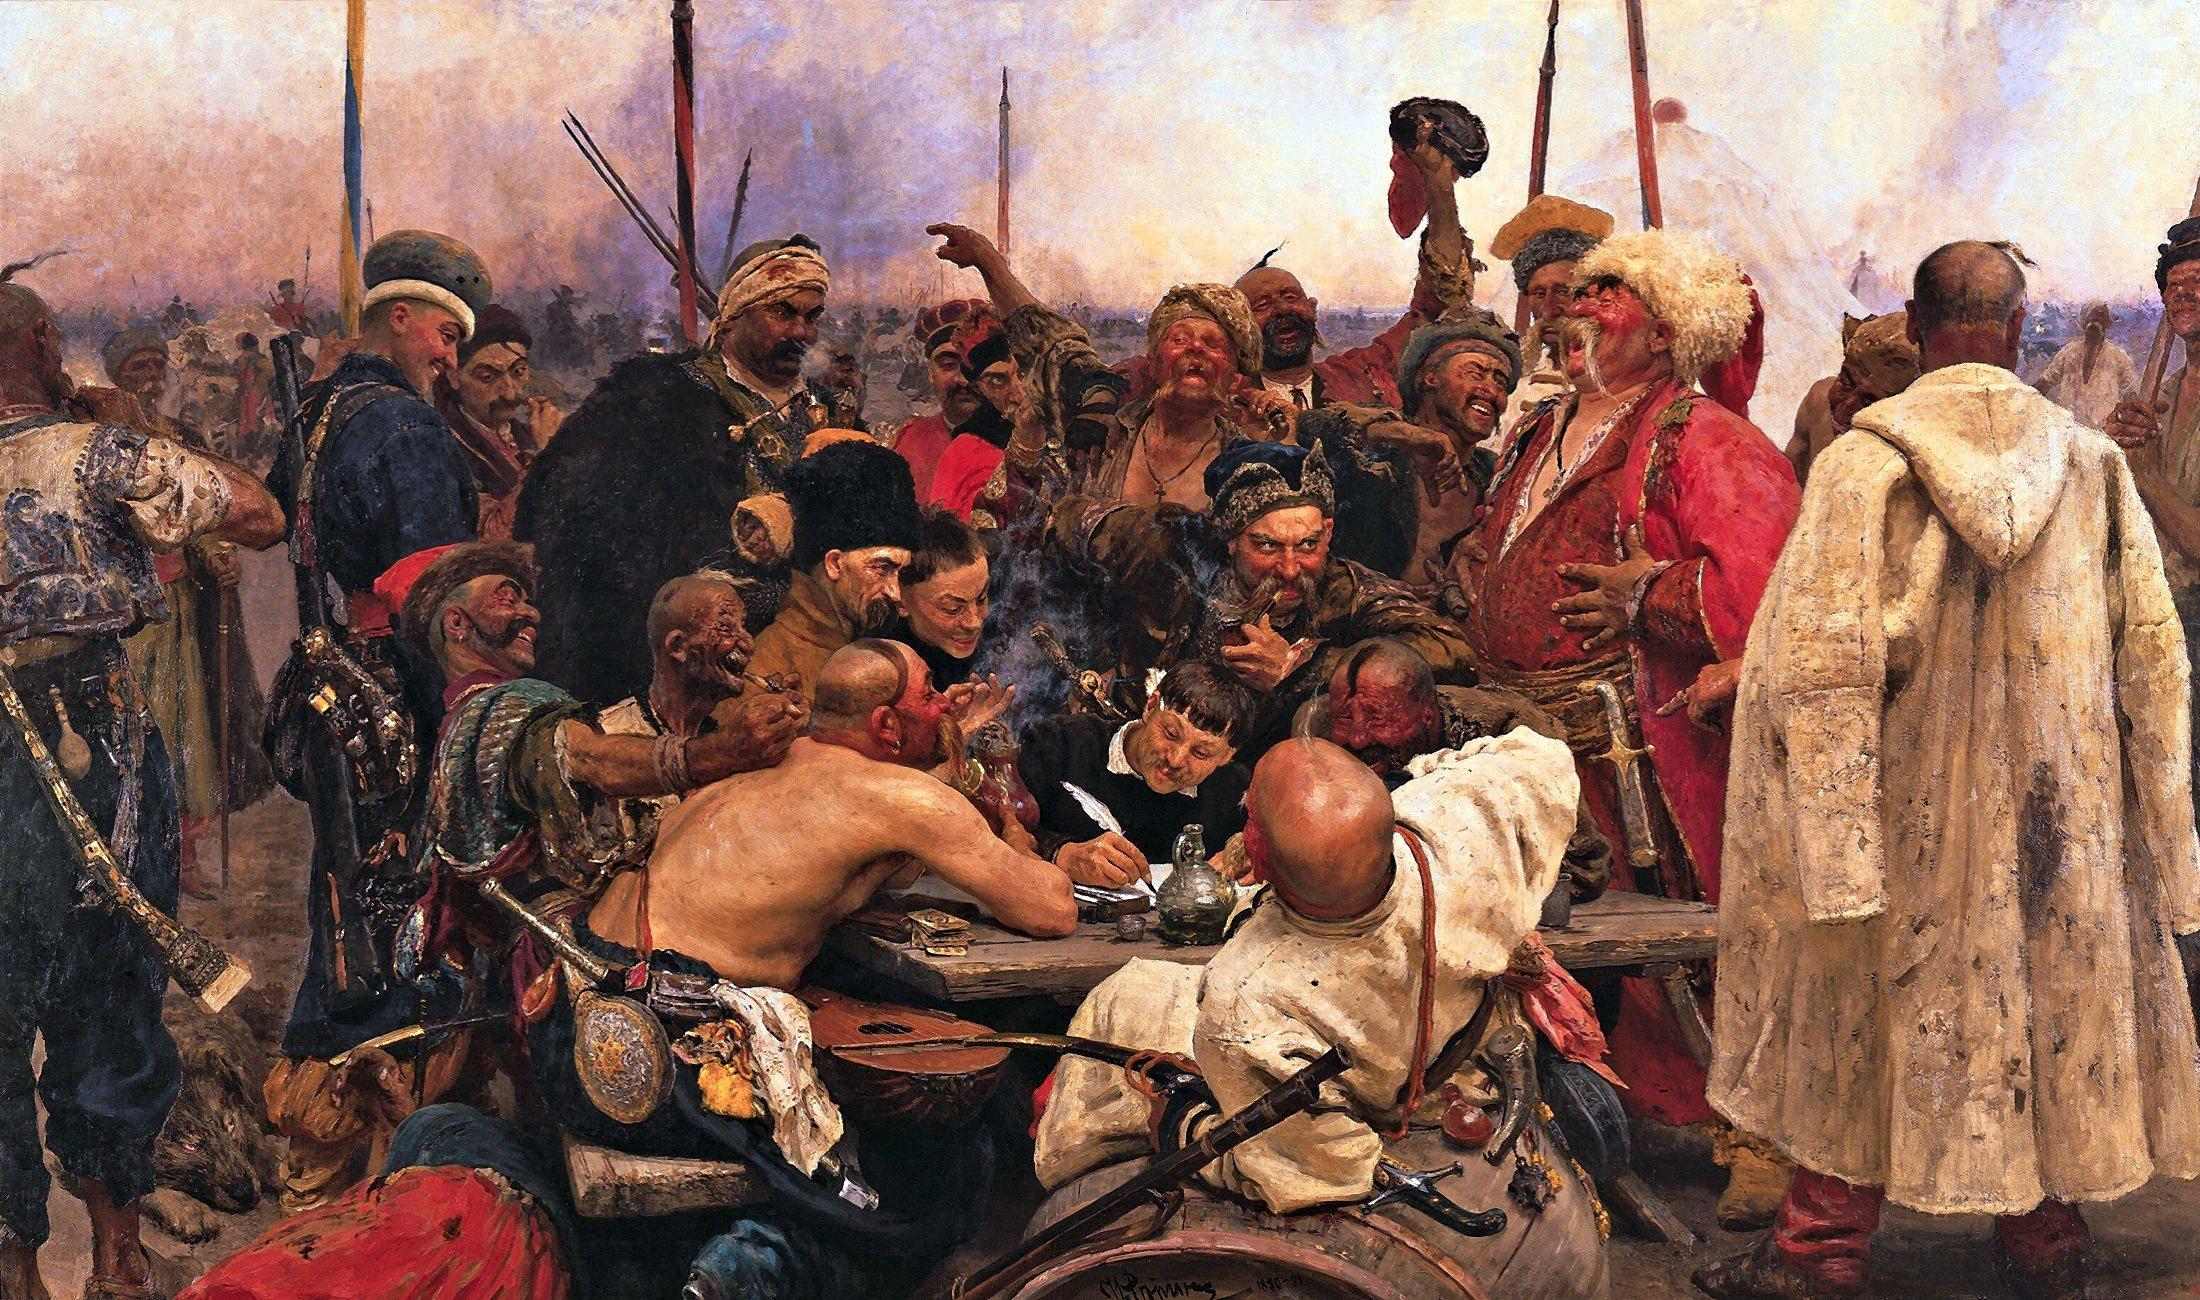 00 Ilya Repin. The Zaporozhe Cossacks Write a Mocking Letter to the Turkish Sultan. 1891